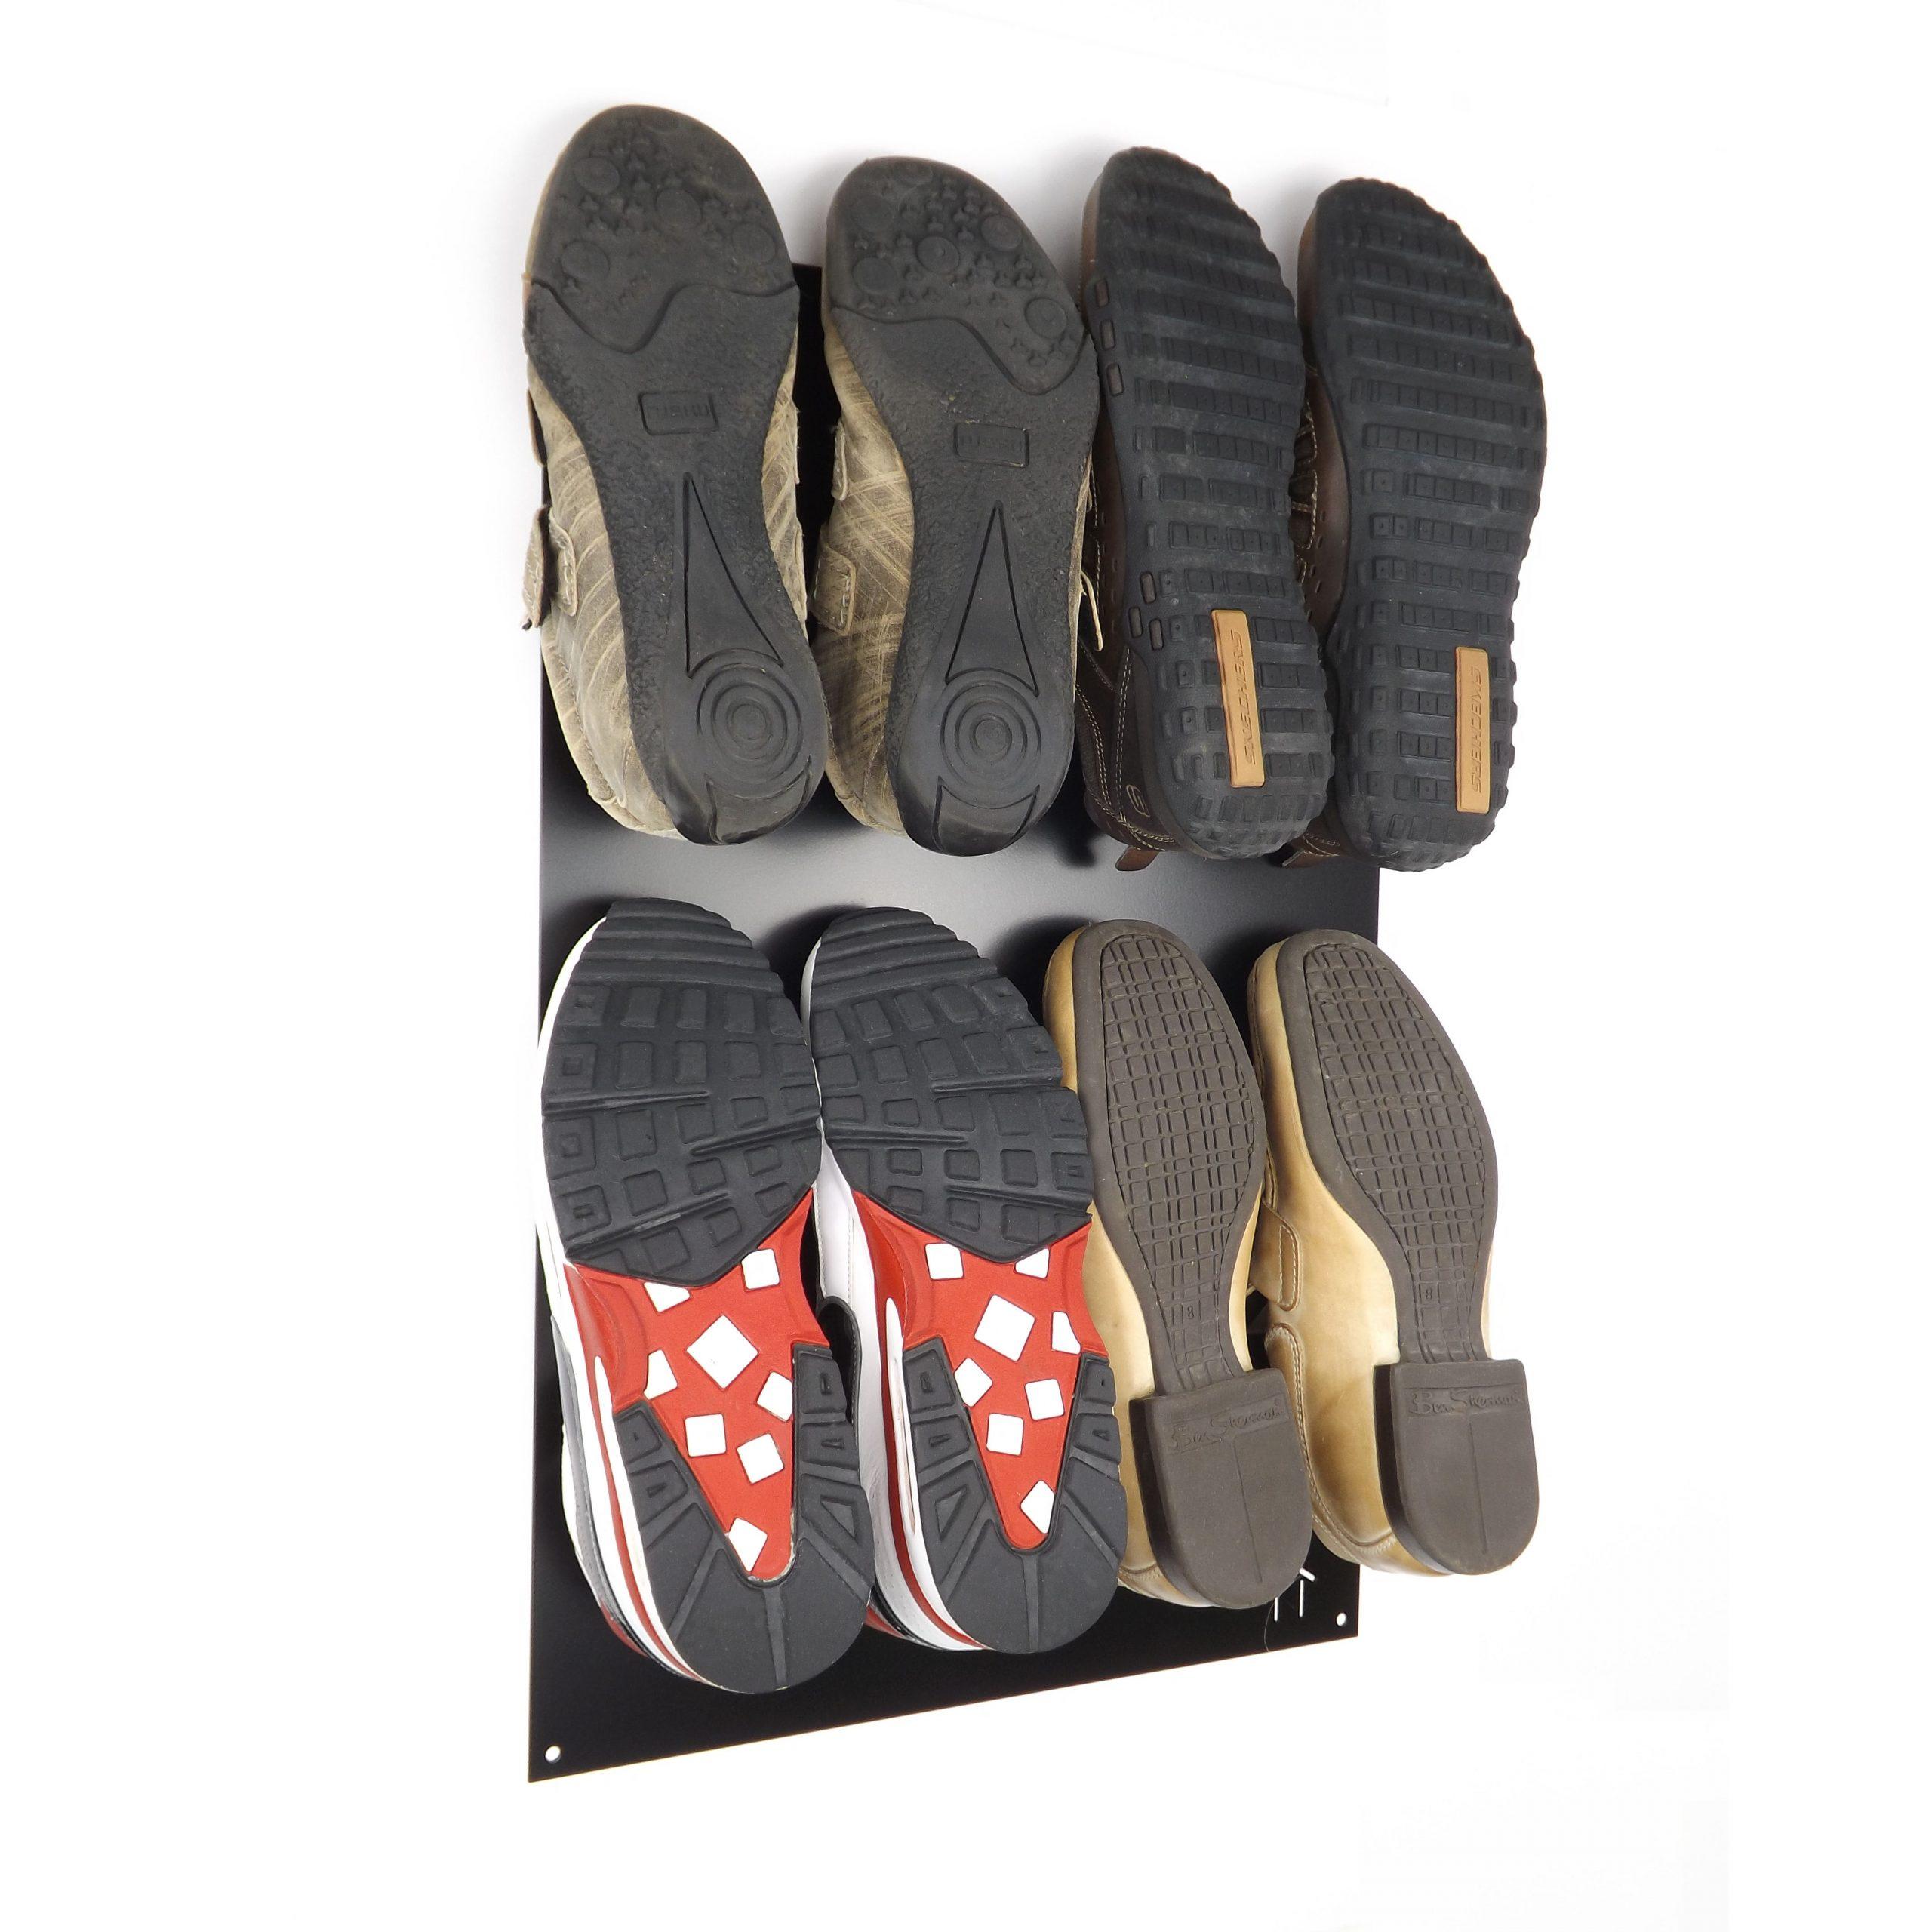 4 Shoe Black